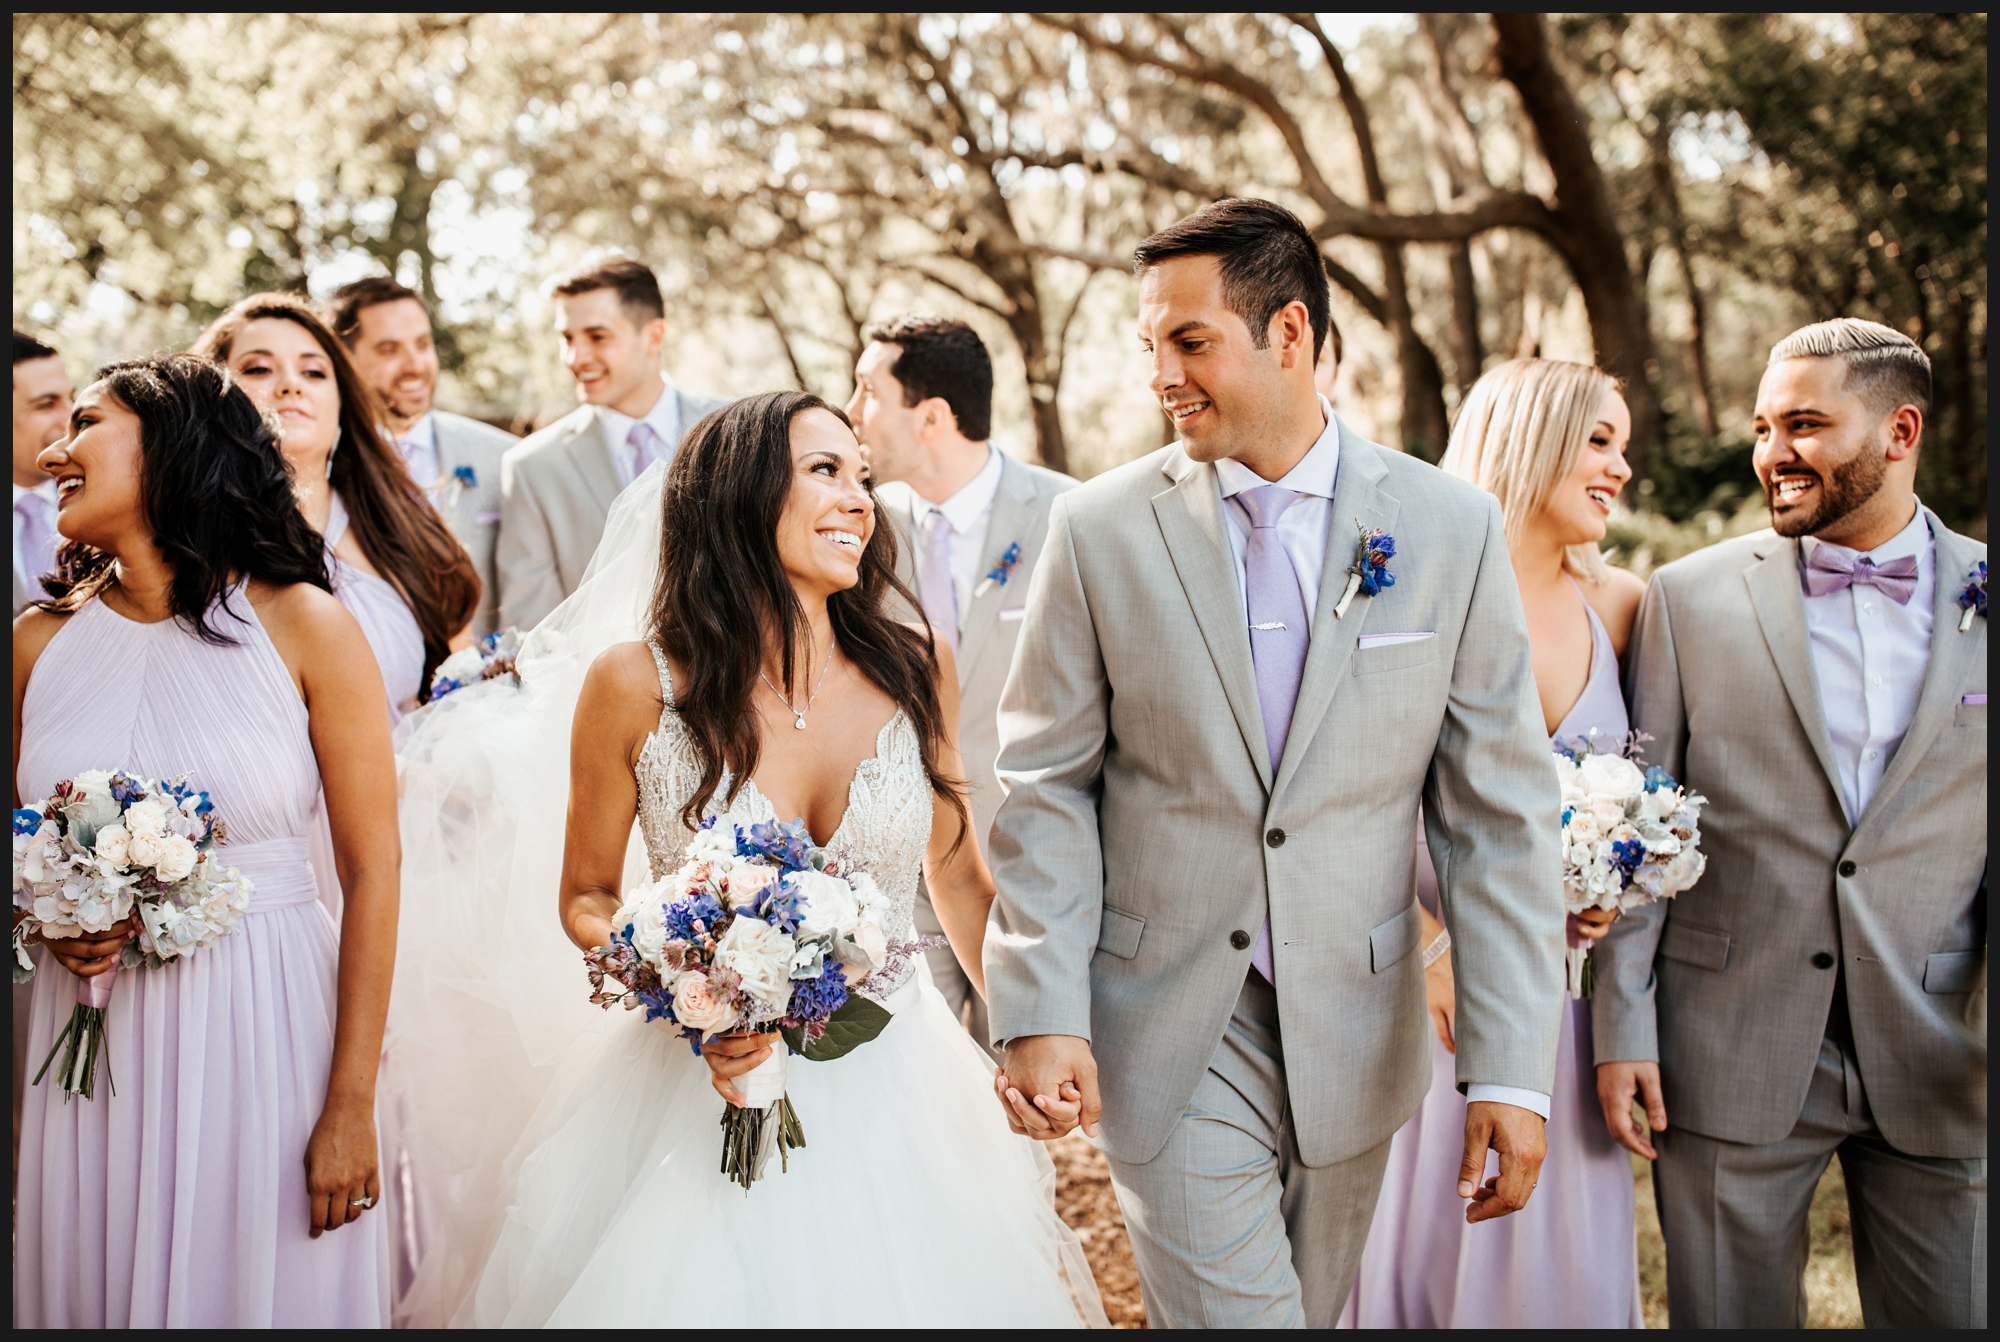 Orlando-Wedding-Photographer-destination-wedding-photographer-florida-wedding-photographer-bohemian-wedding-photographer_1621.jpg